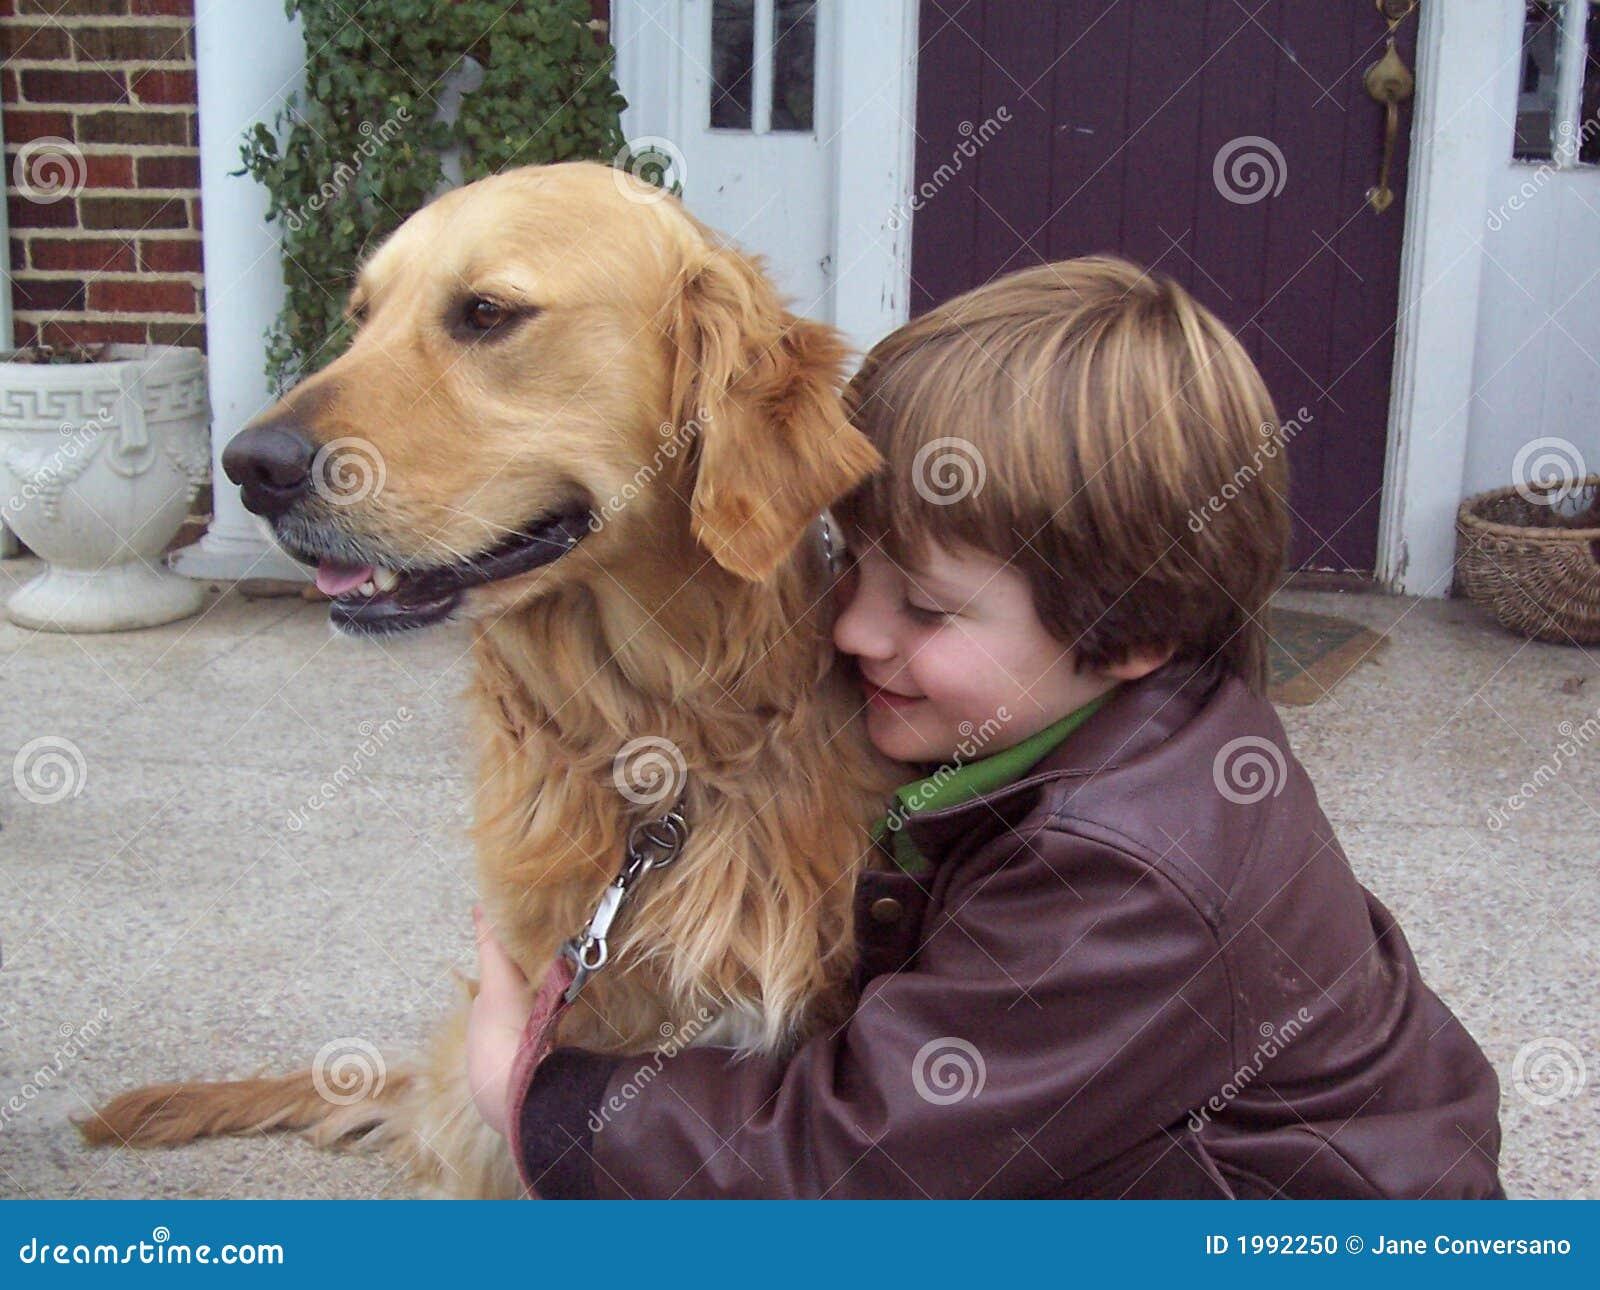 Boy and golden retriever portrait